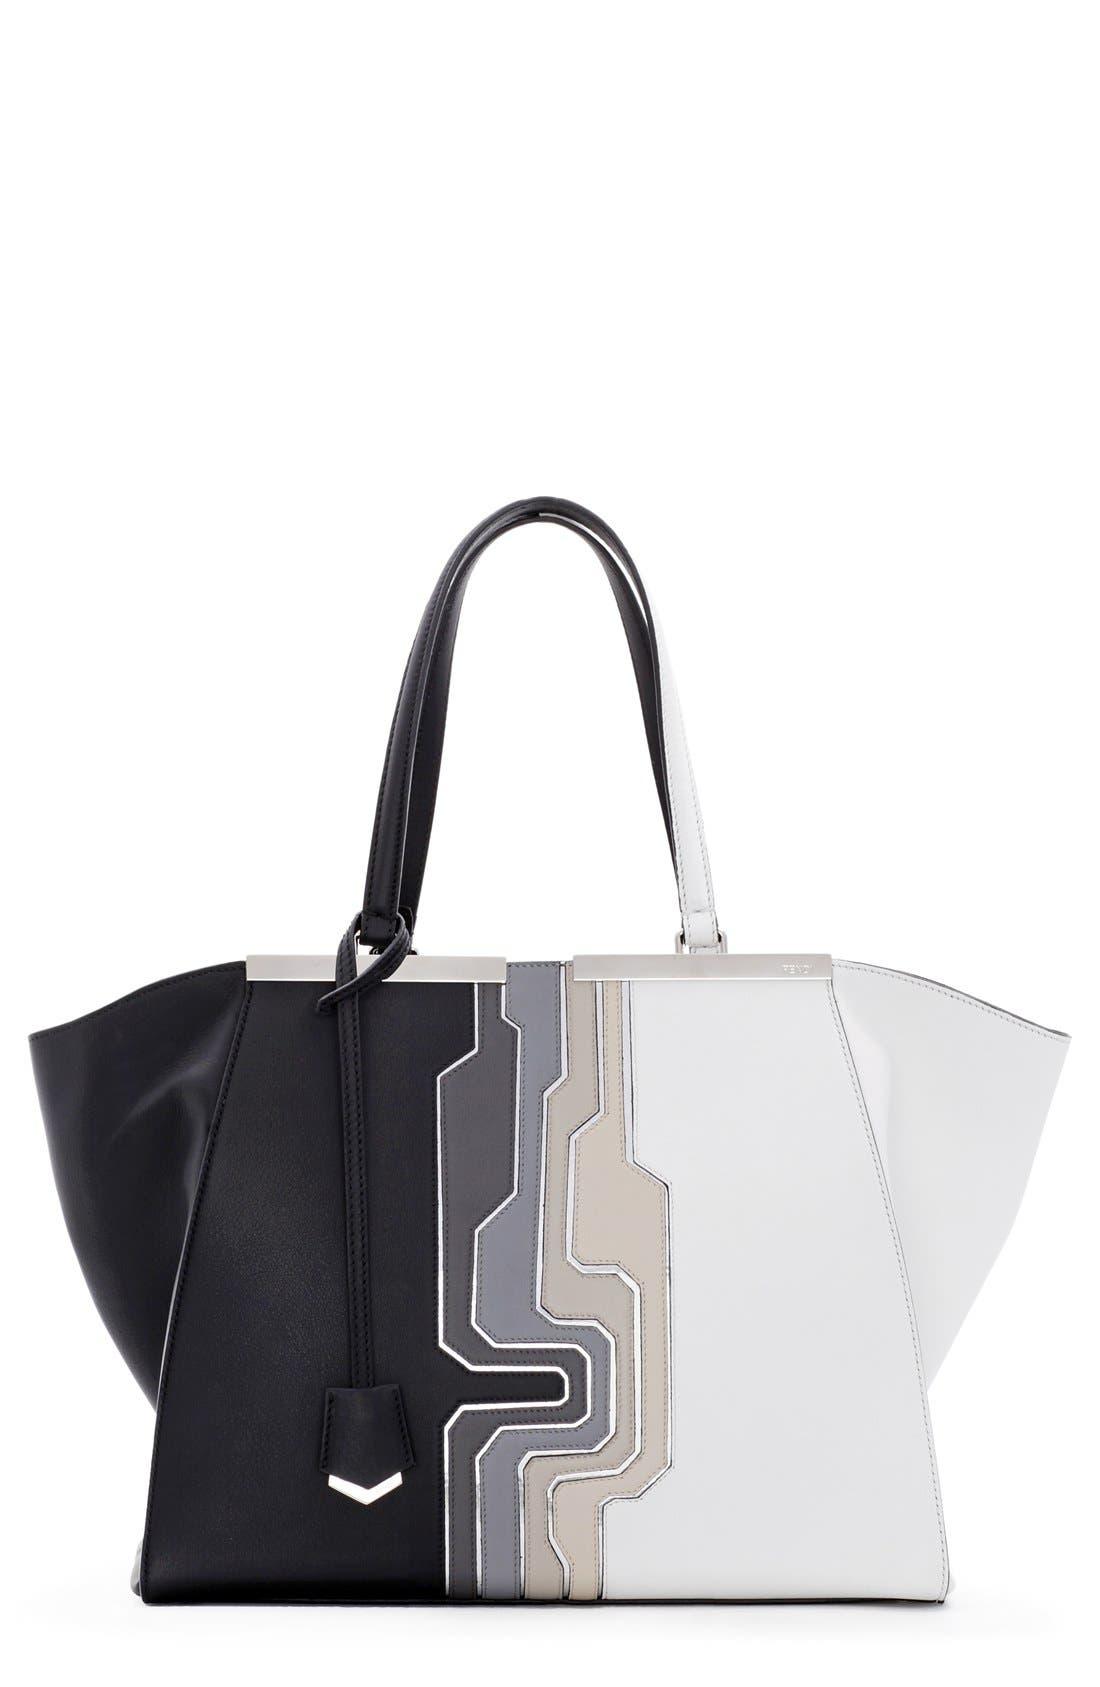 Alternate Image 1 Selected - Fendi '3Jours - Computer' Leather Shopper